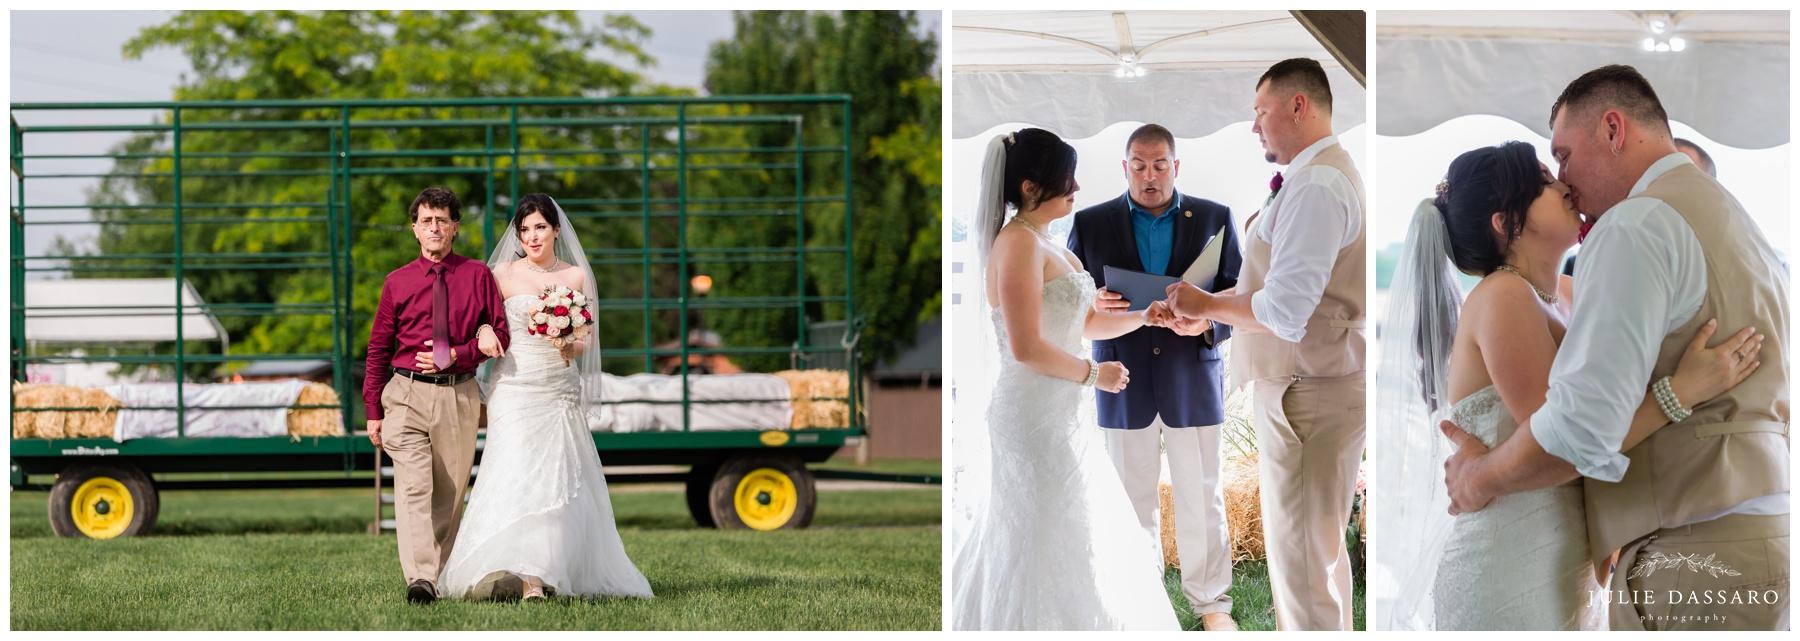 Donaldson Farm NJ wedding